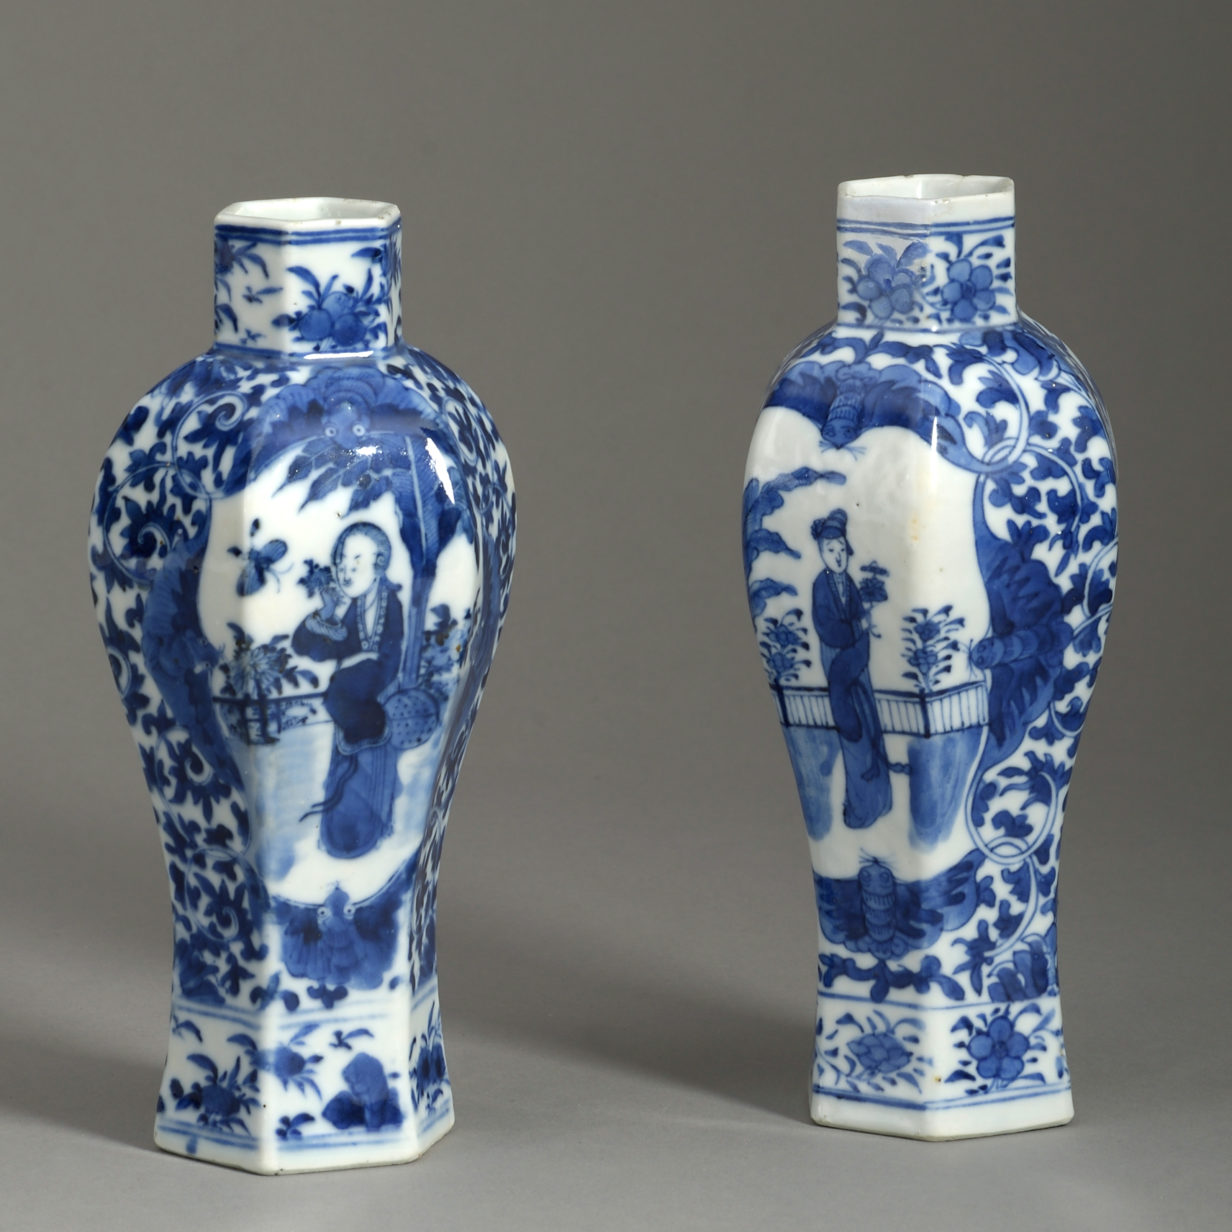 Pair of Small Blue & White Vases